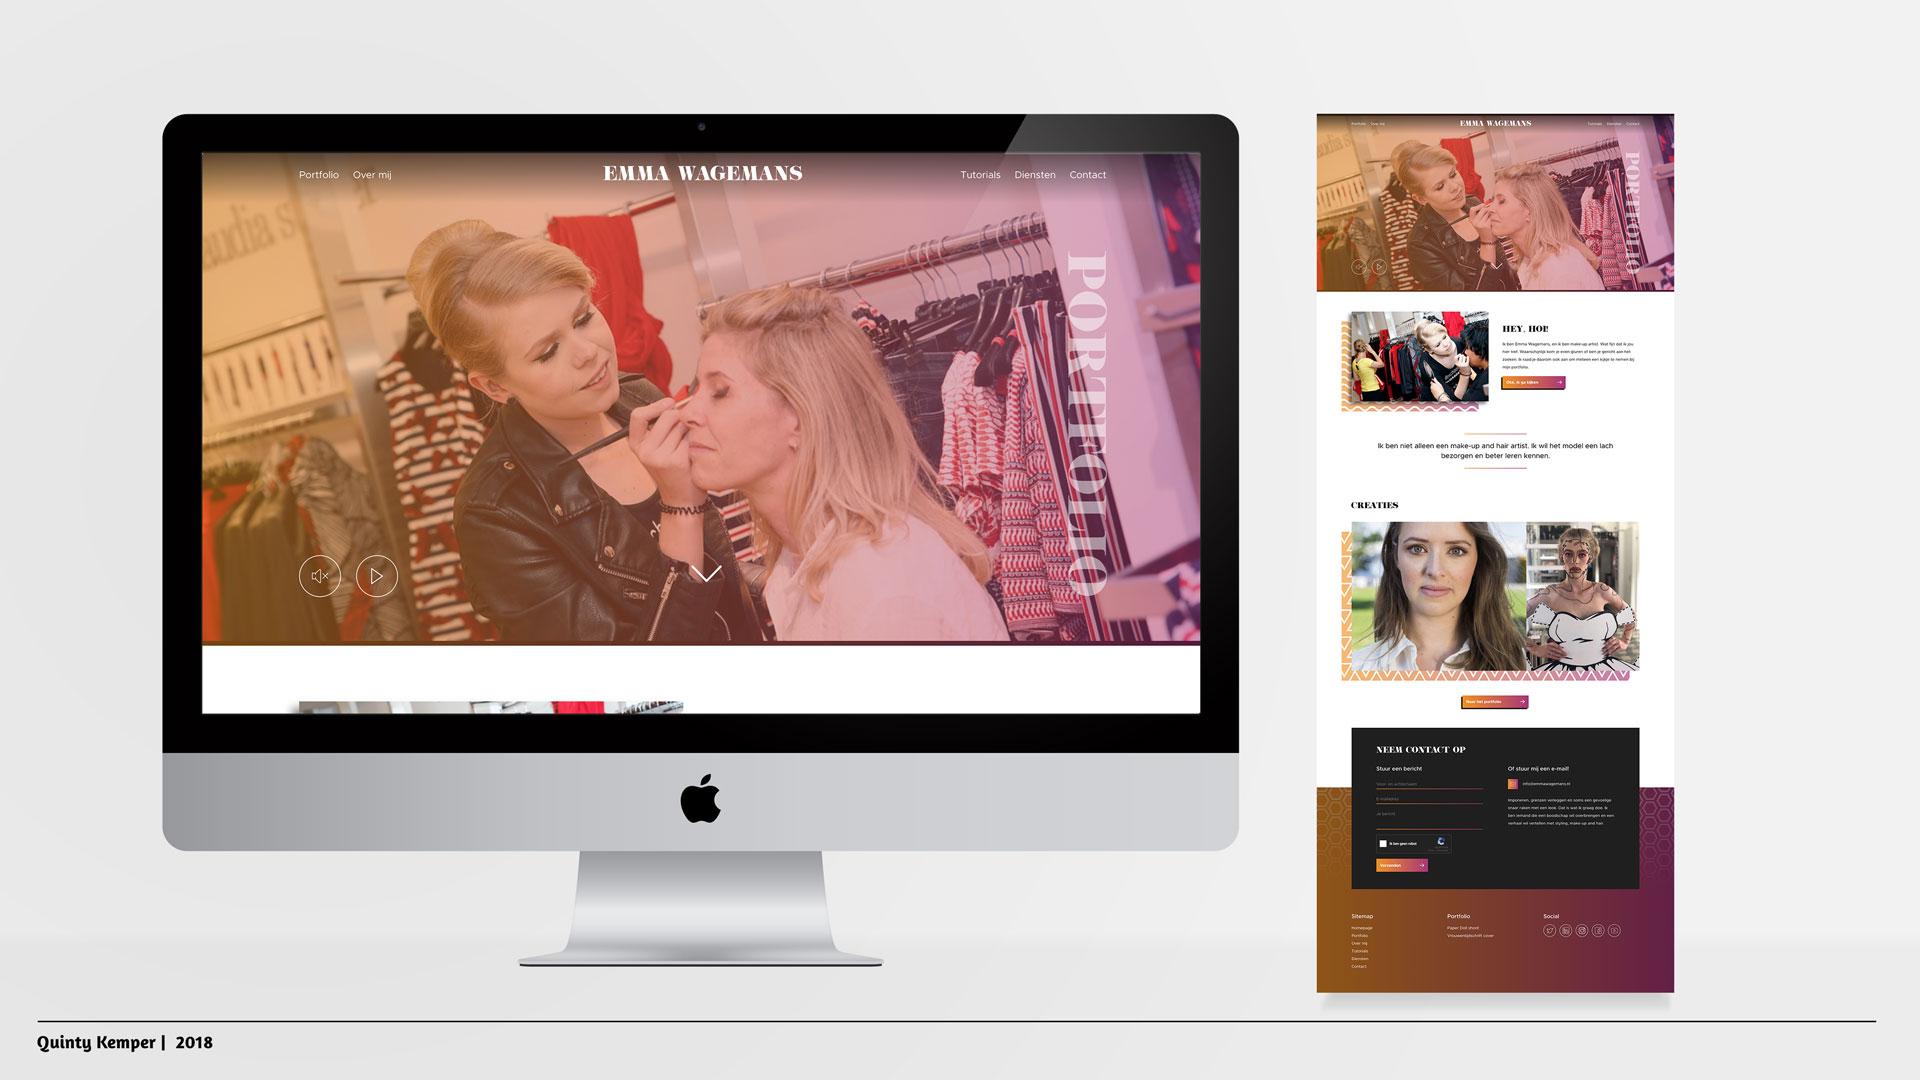 Quinty Kemper Portfolio 2018 Portfolio website Emma Wagemans Home pagina